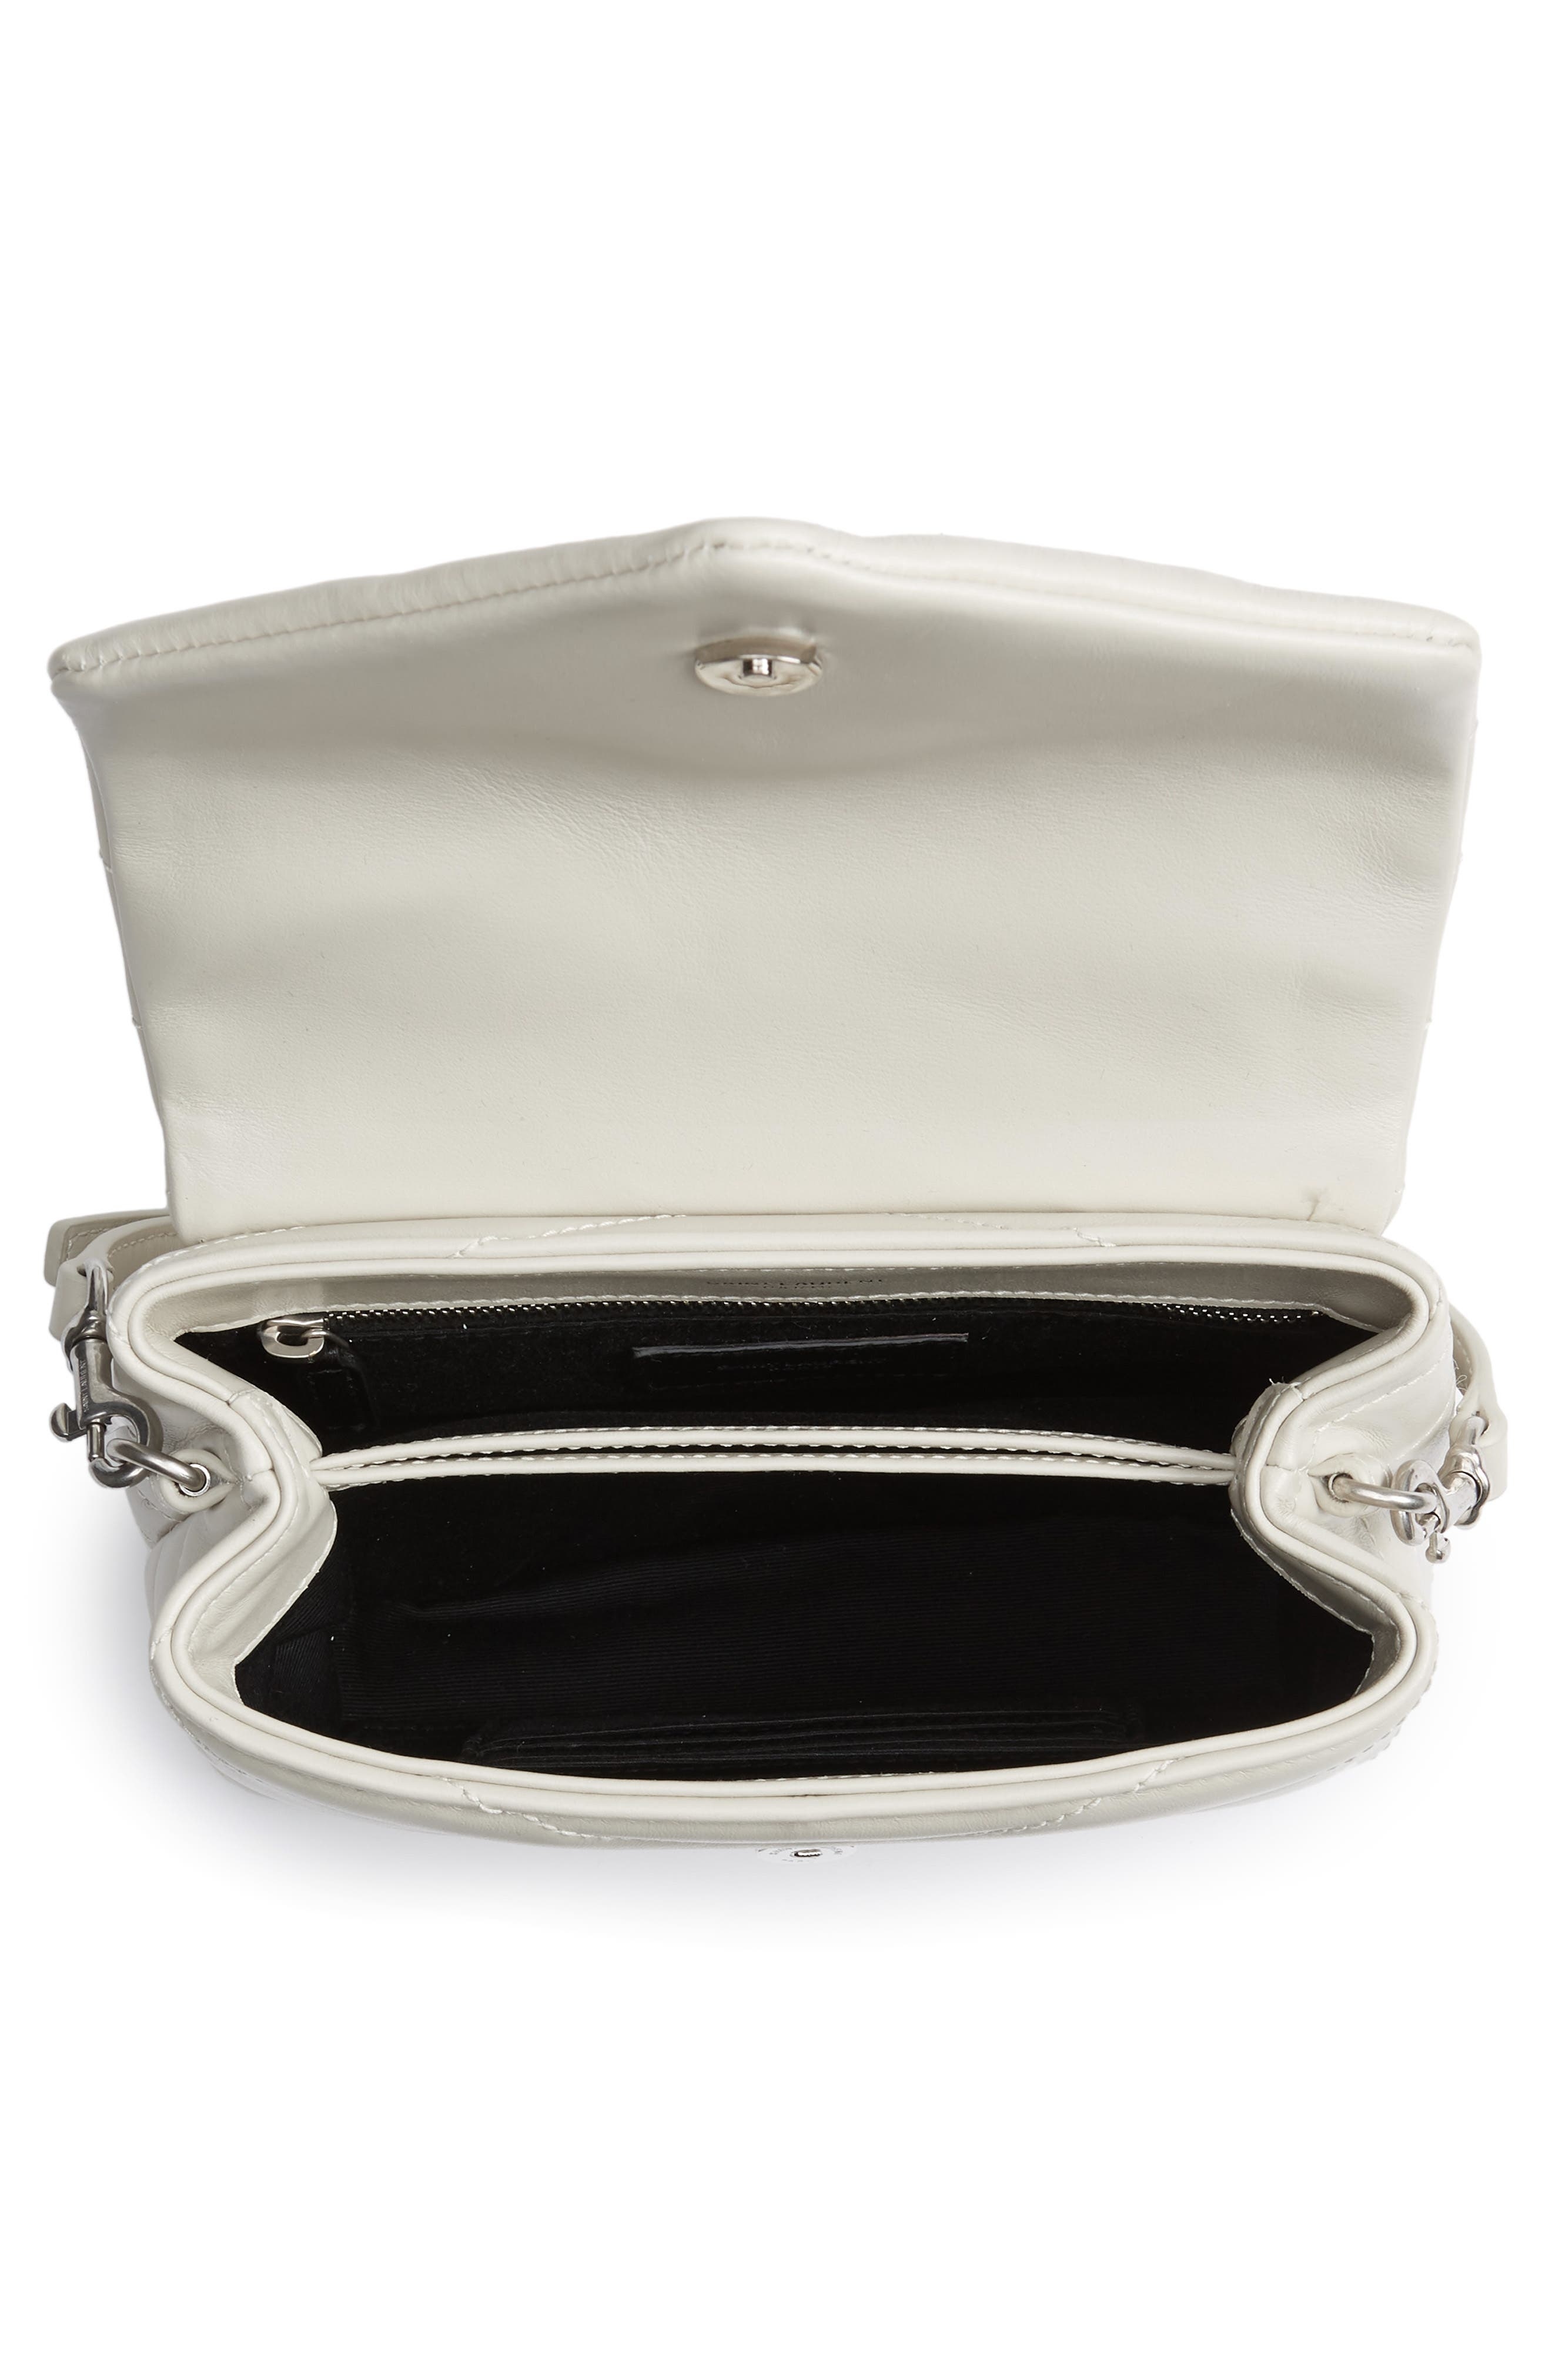 SAINT LAURENT, Toy Loulou Calfskin Leather Crossbody Bag, Alternate thumbnail 4, color, CREMA SOFT